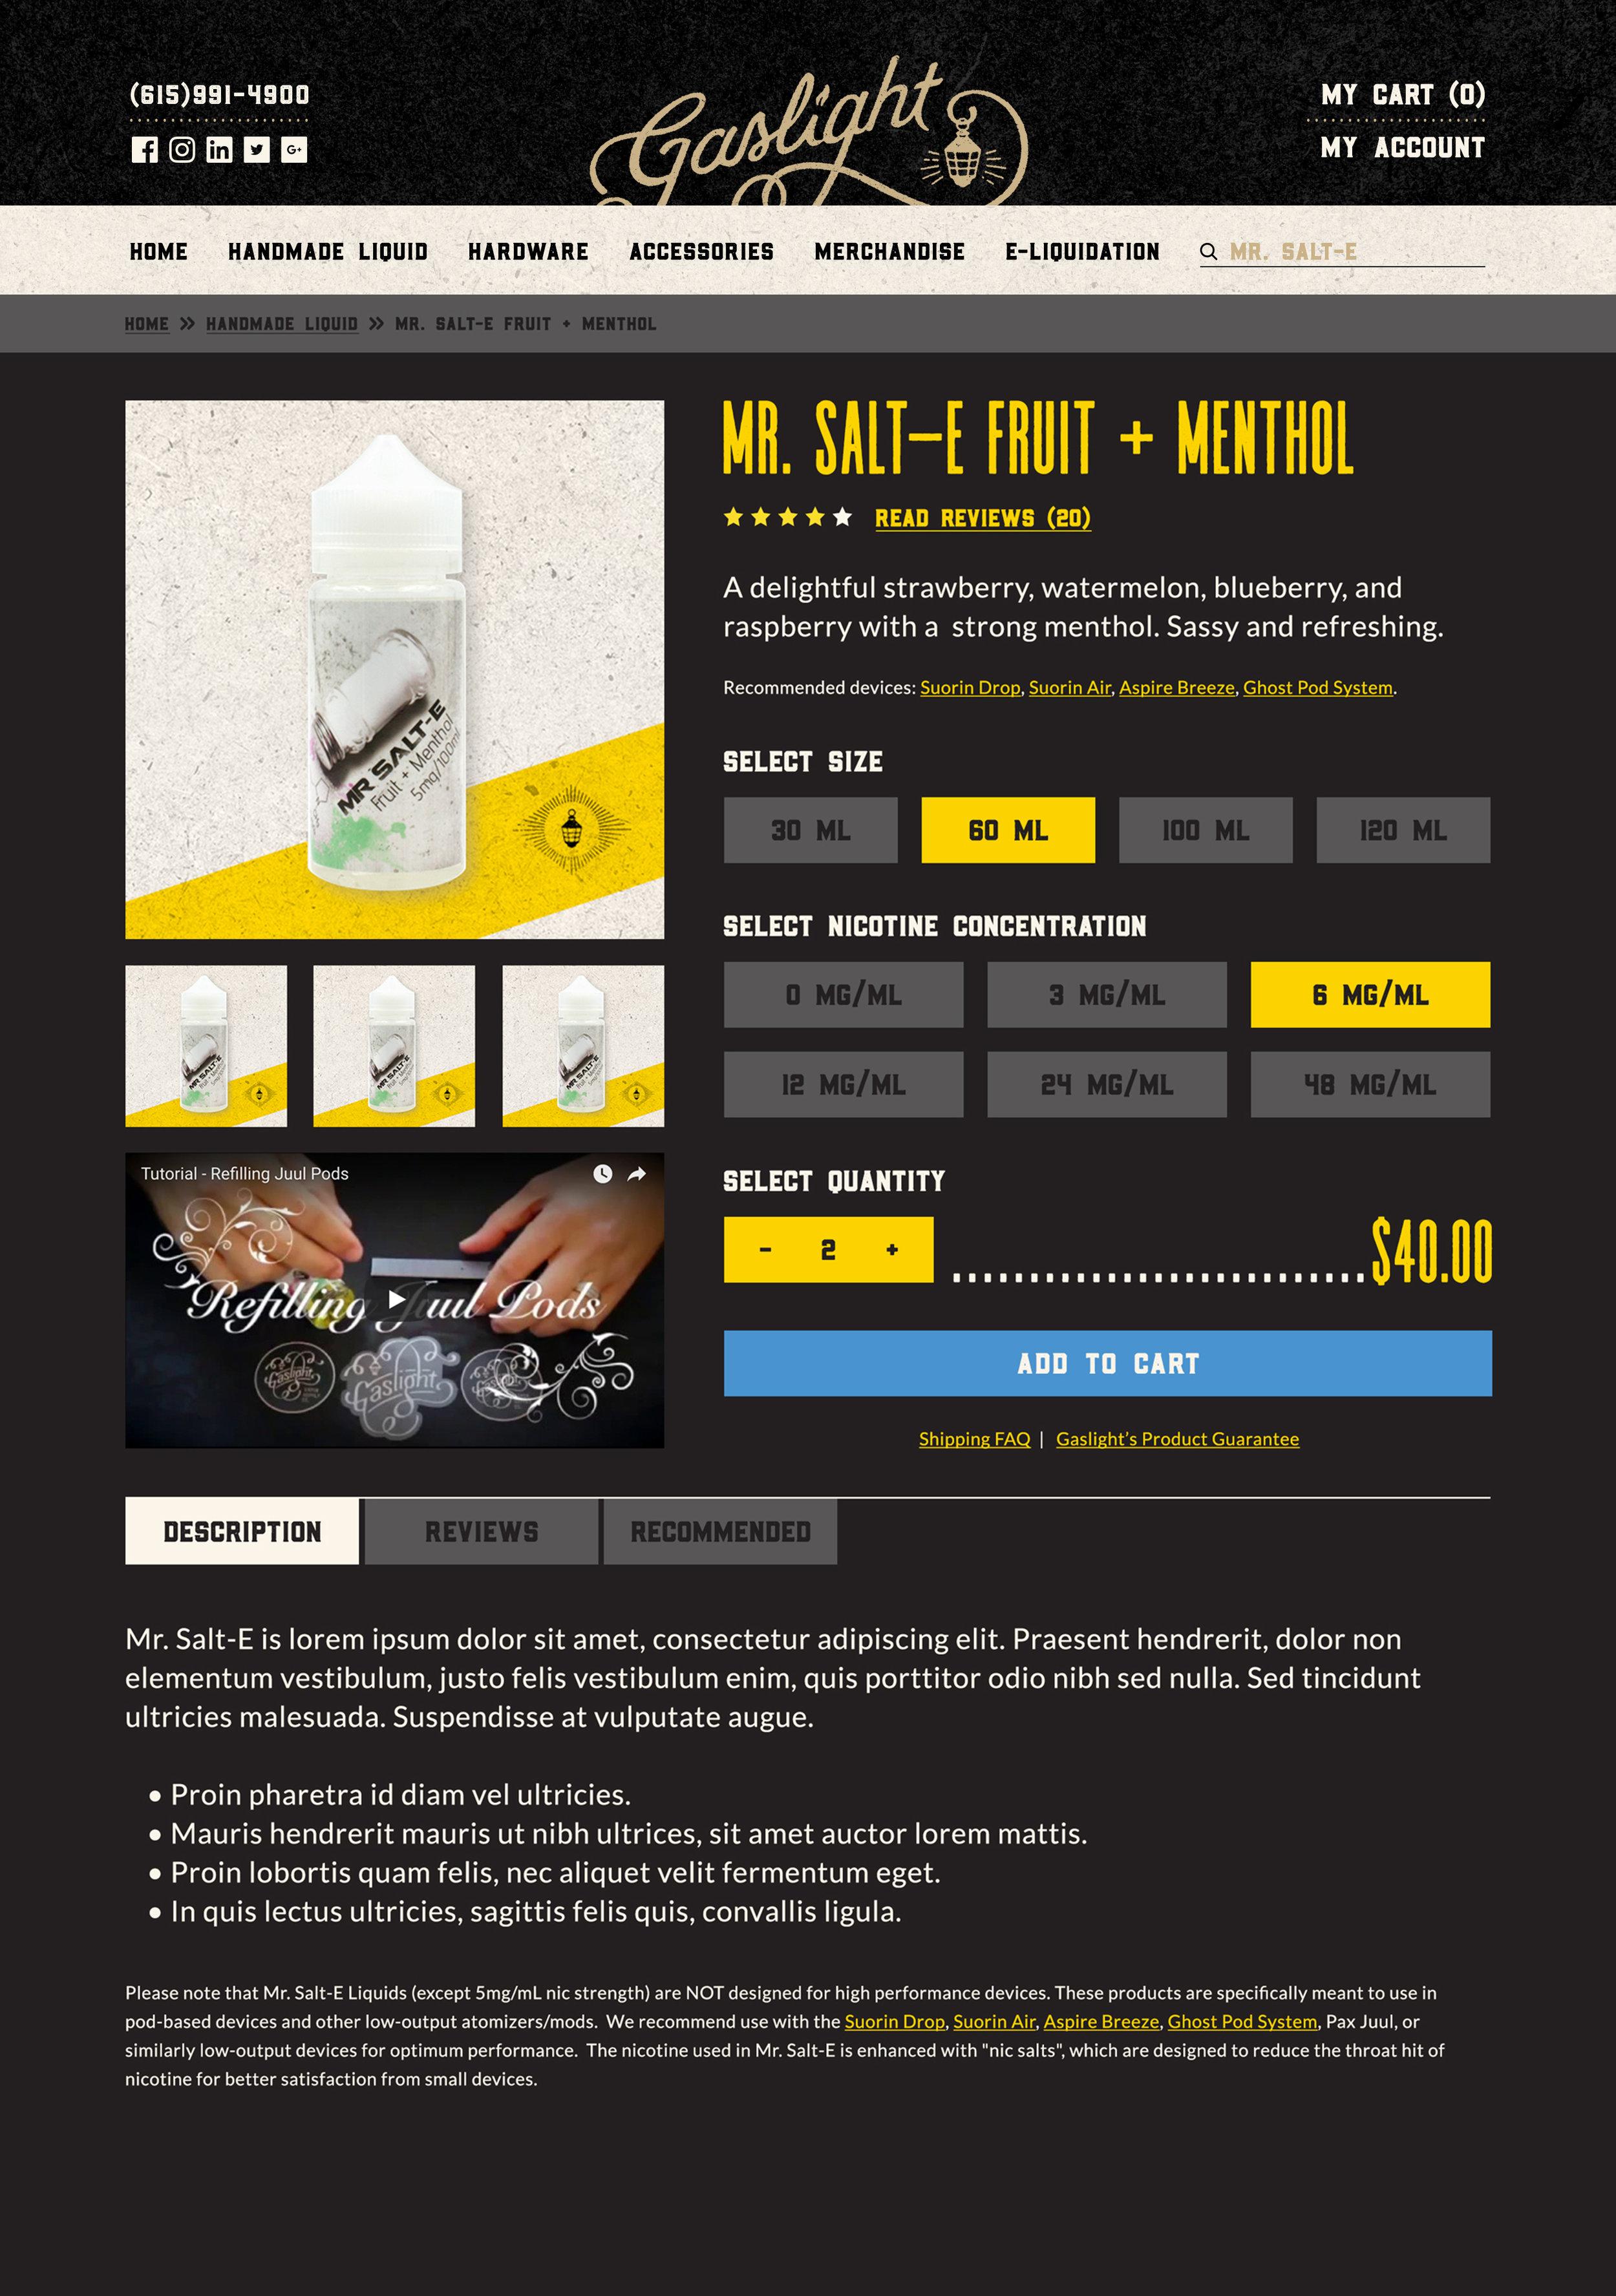 GS-web-product-black-updated.jpg